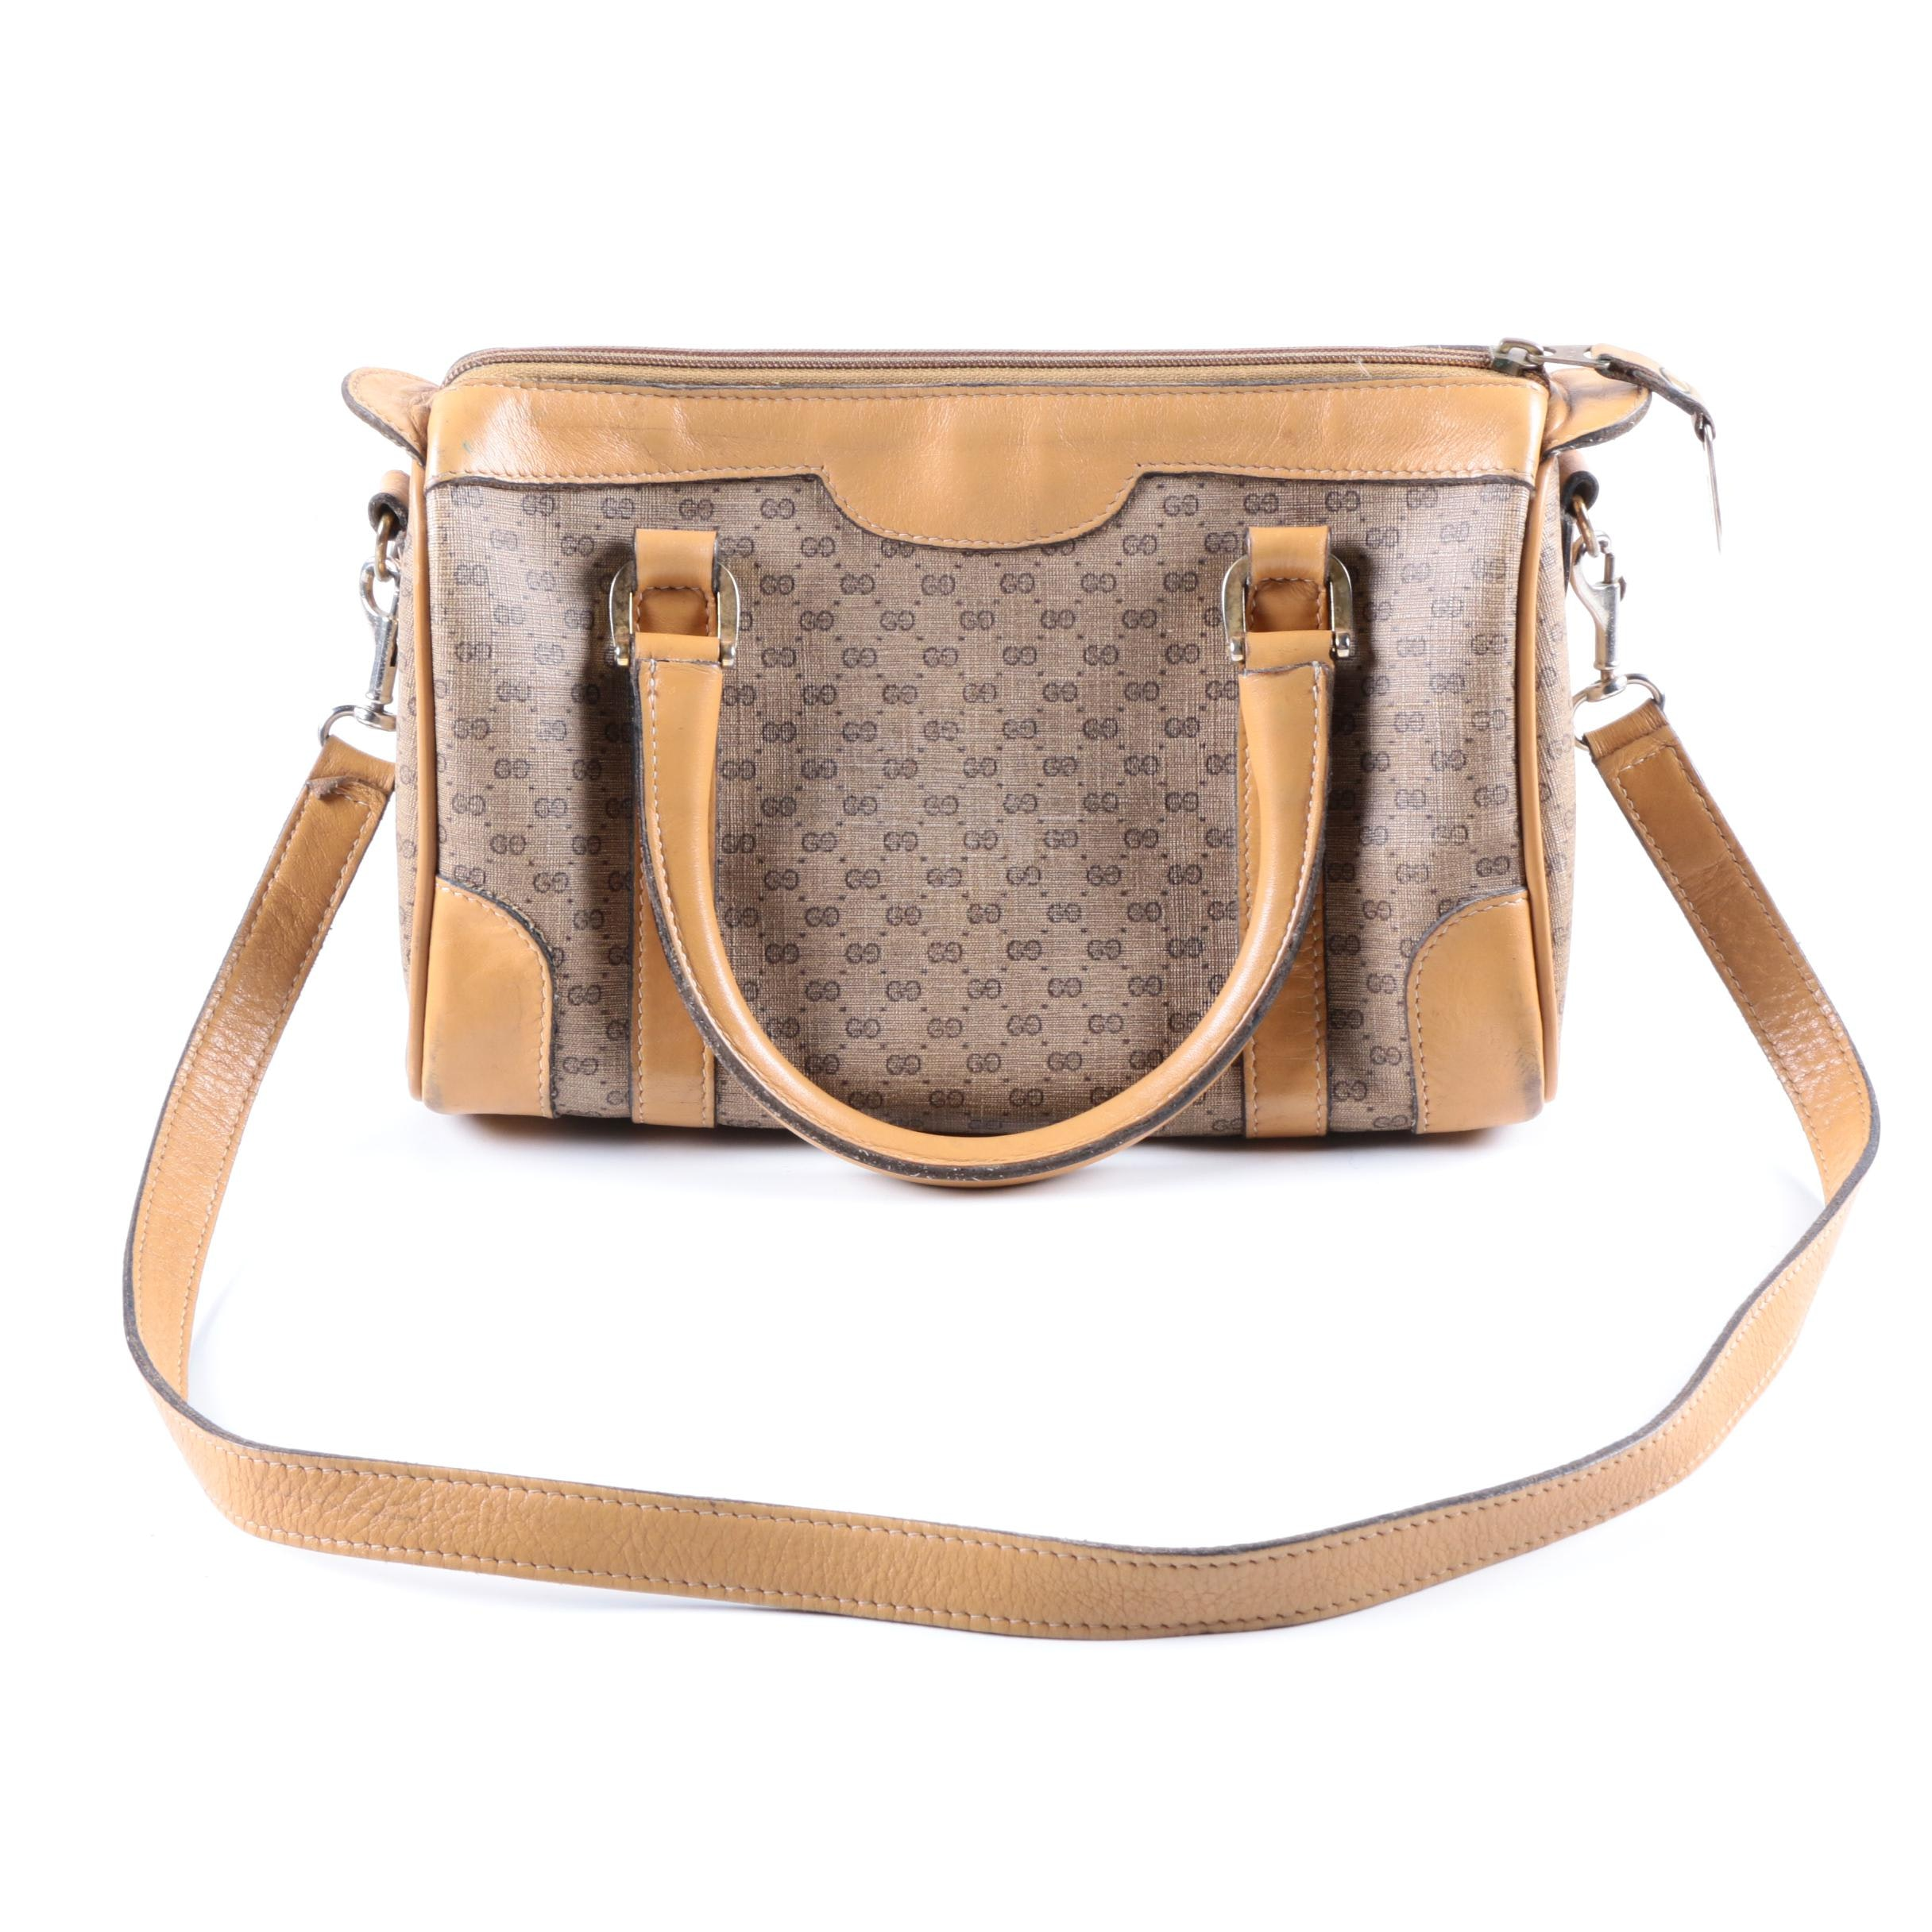 Gucci Monogrammed Canvas Bag